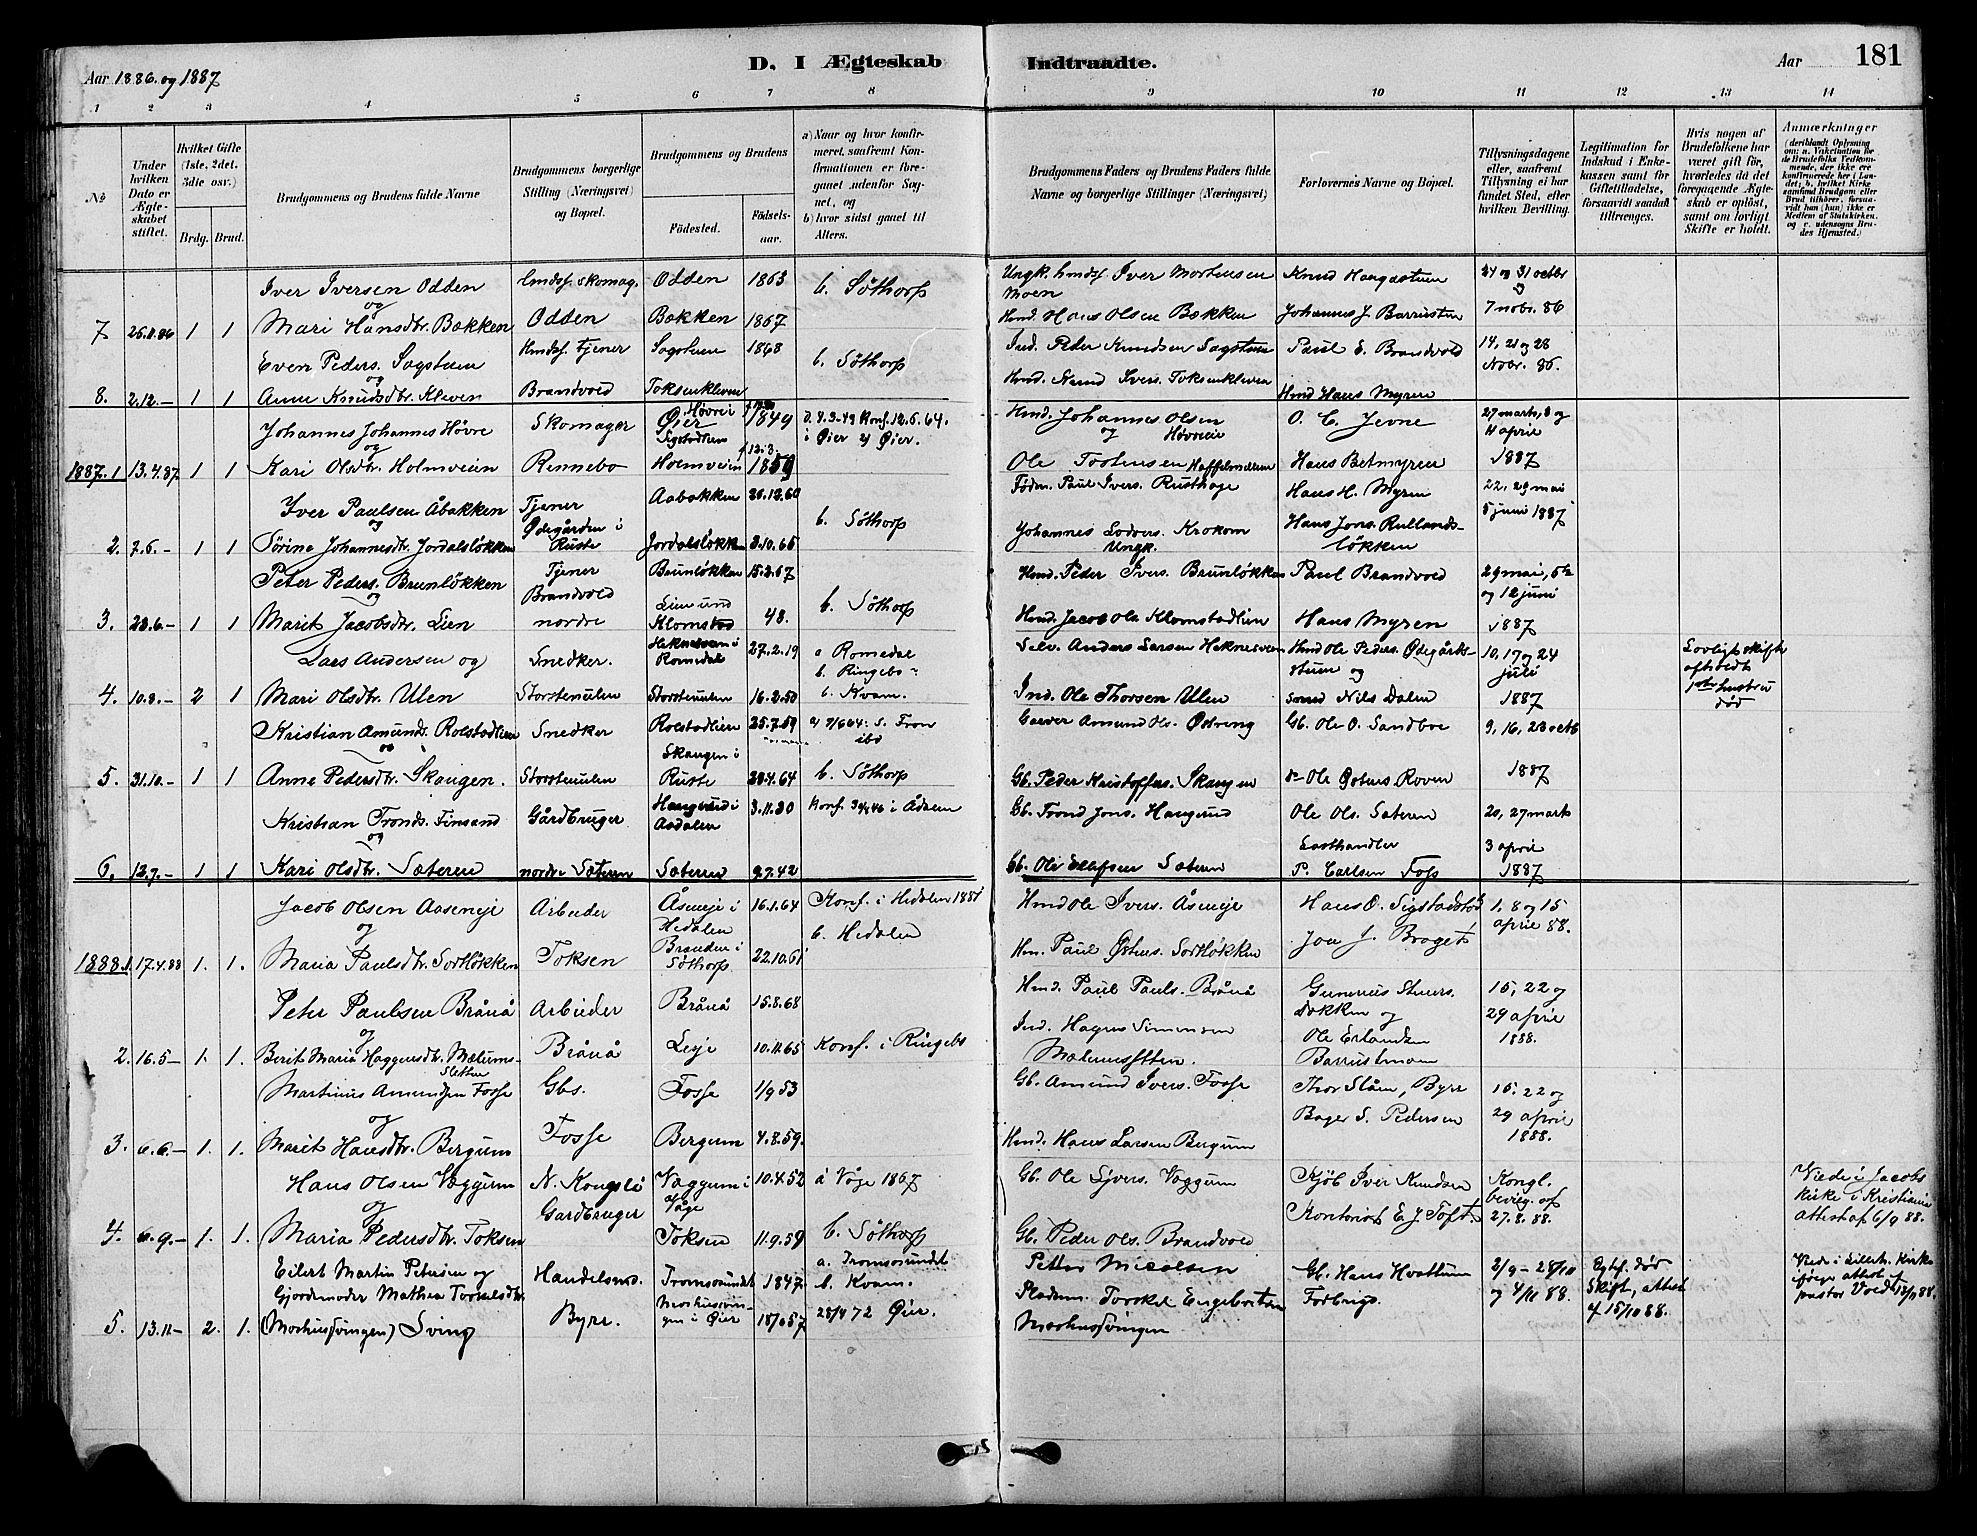 SAH, Nord-Fron prestekontor, Klokkerbok nr. 4, 1884-1914, s. 181